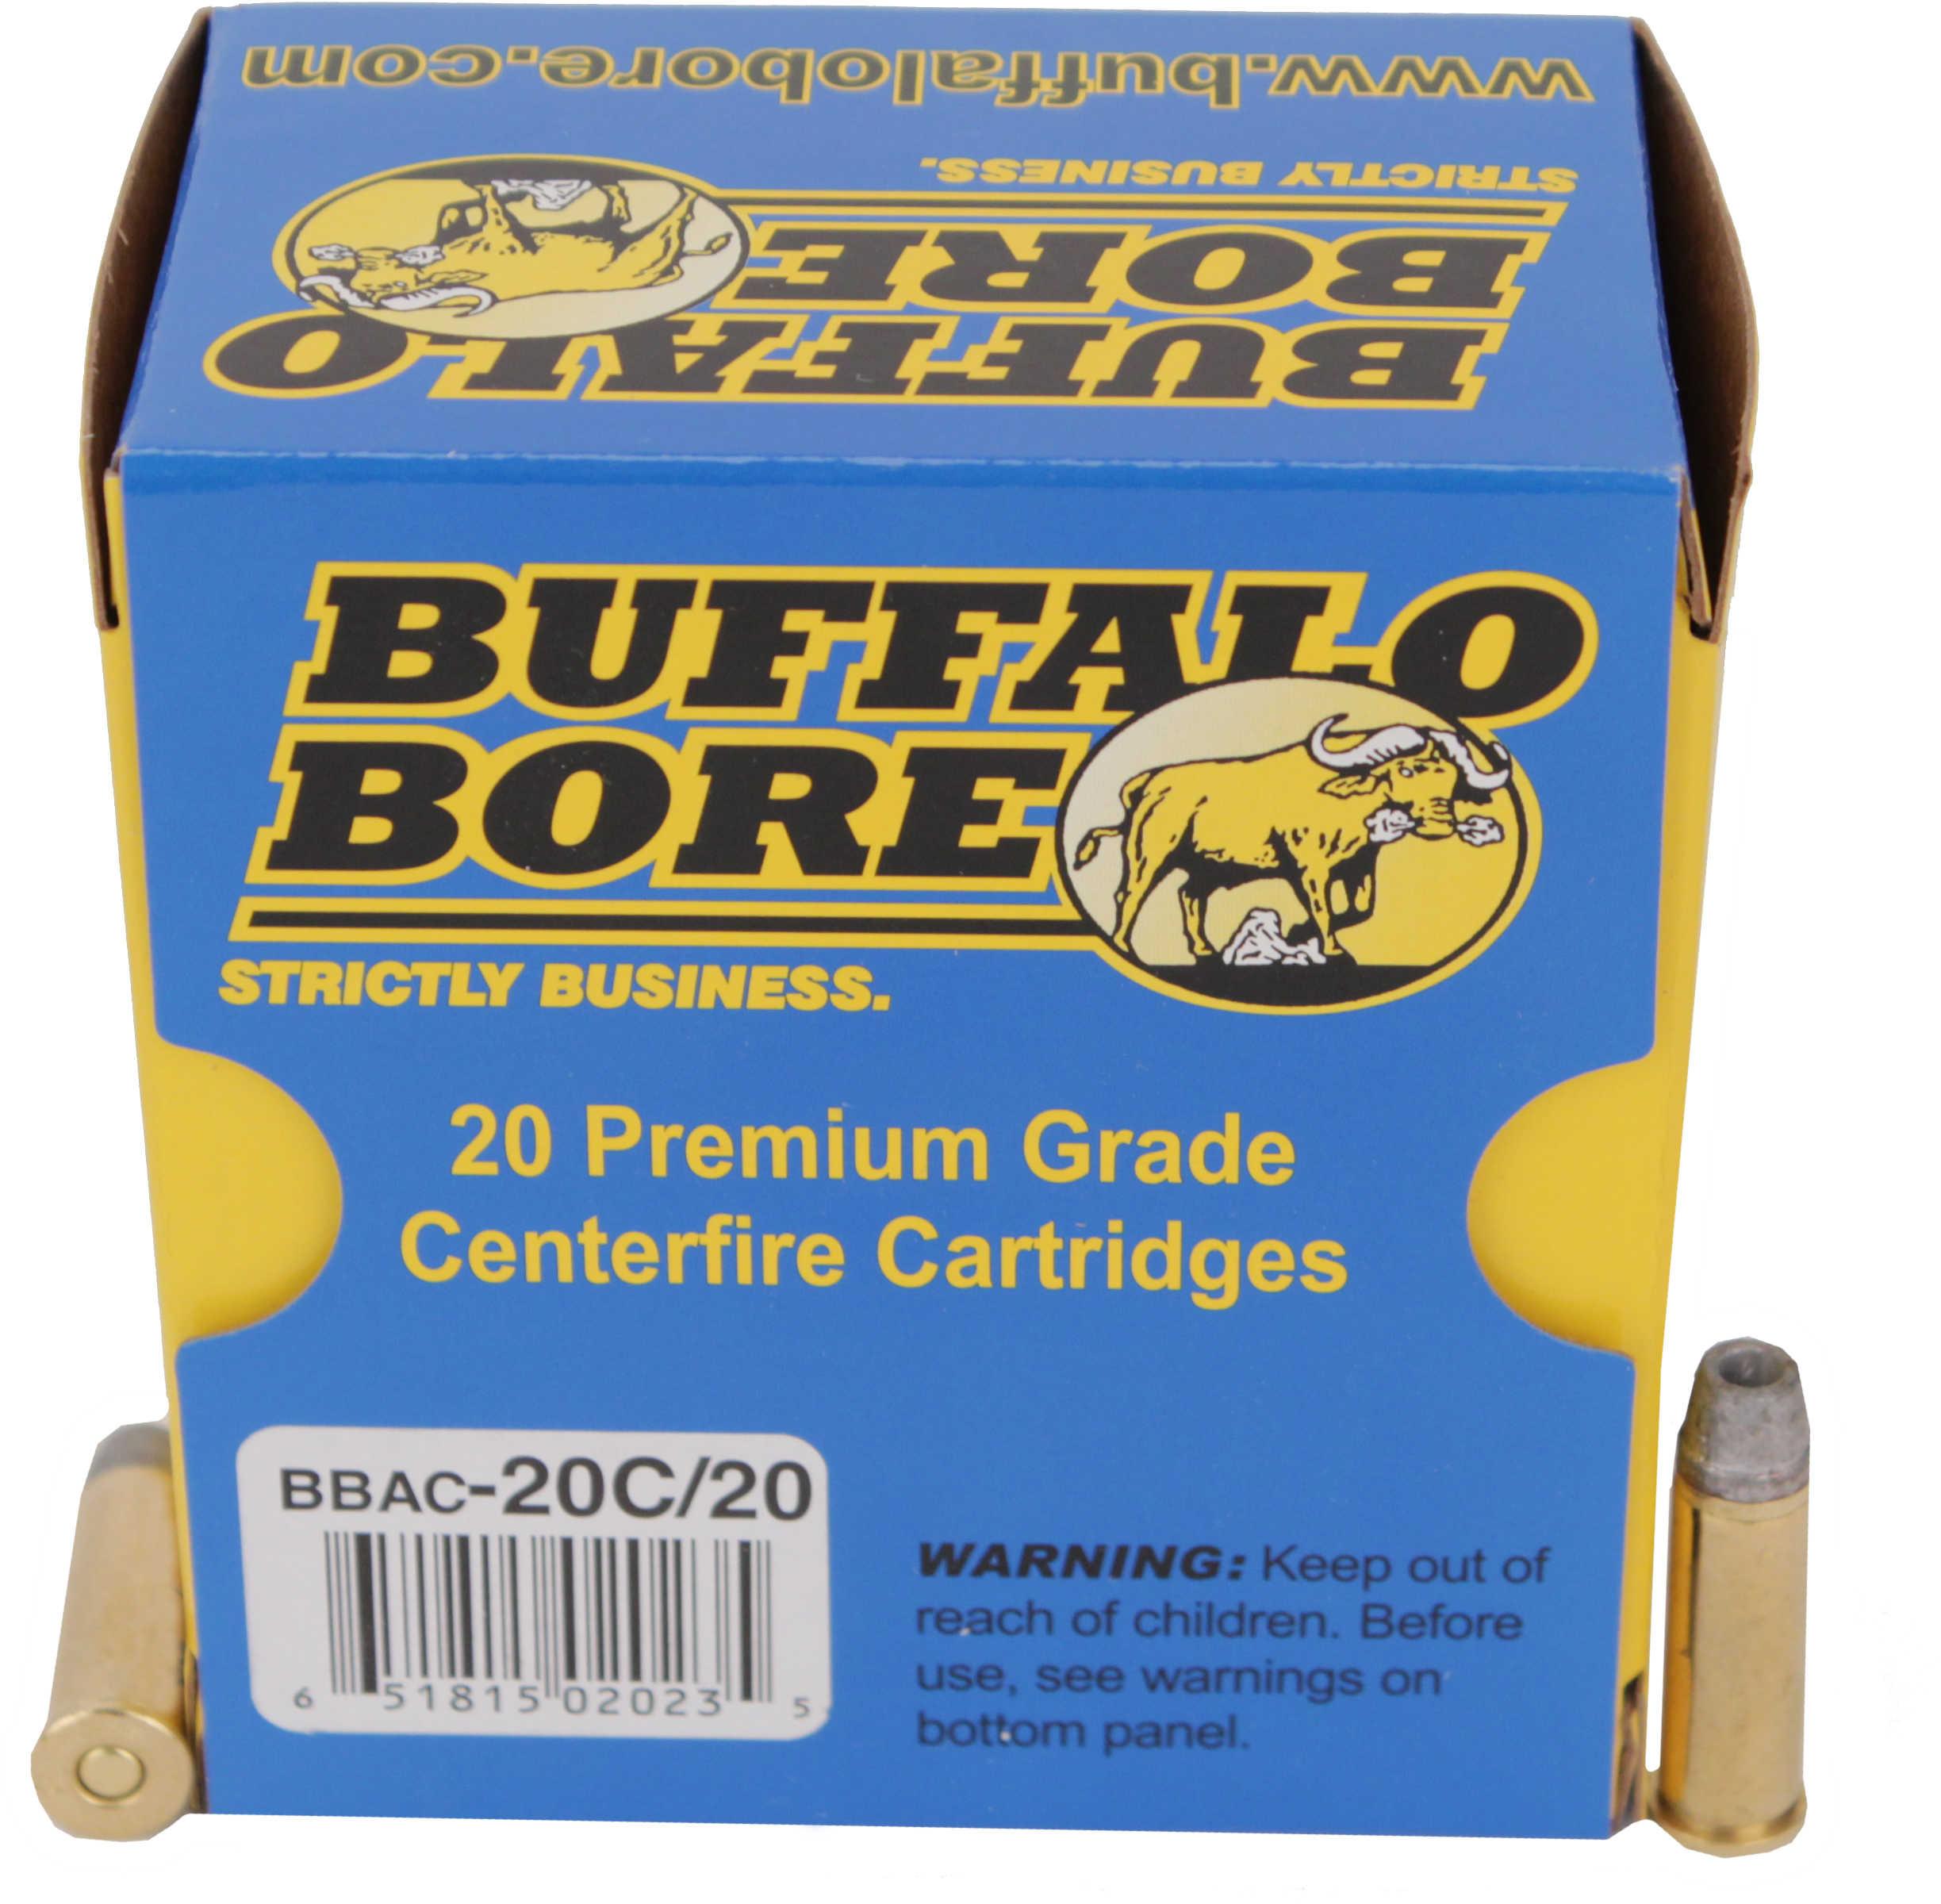 Buffalo Bore Ammunition Short Barrel Low Flash Heavy 38 Special 38 Special 158 Grain Soft Cast Lead Semi Wadcutter Hollow Po